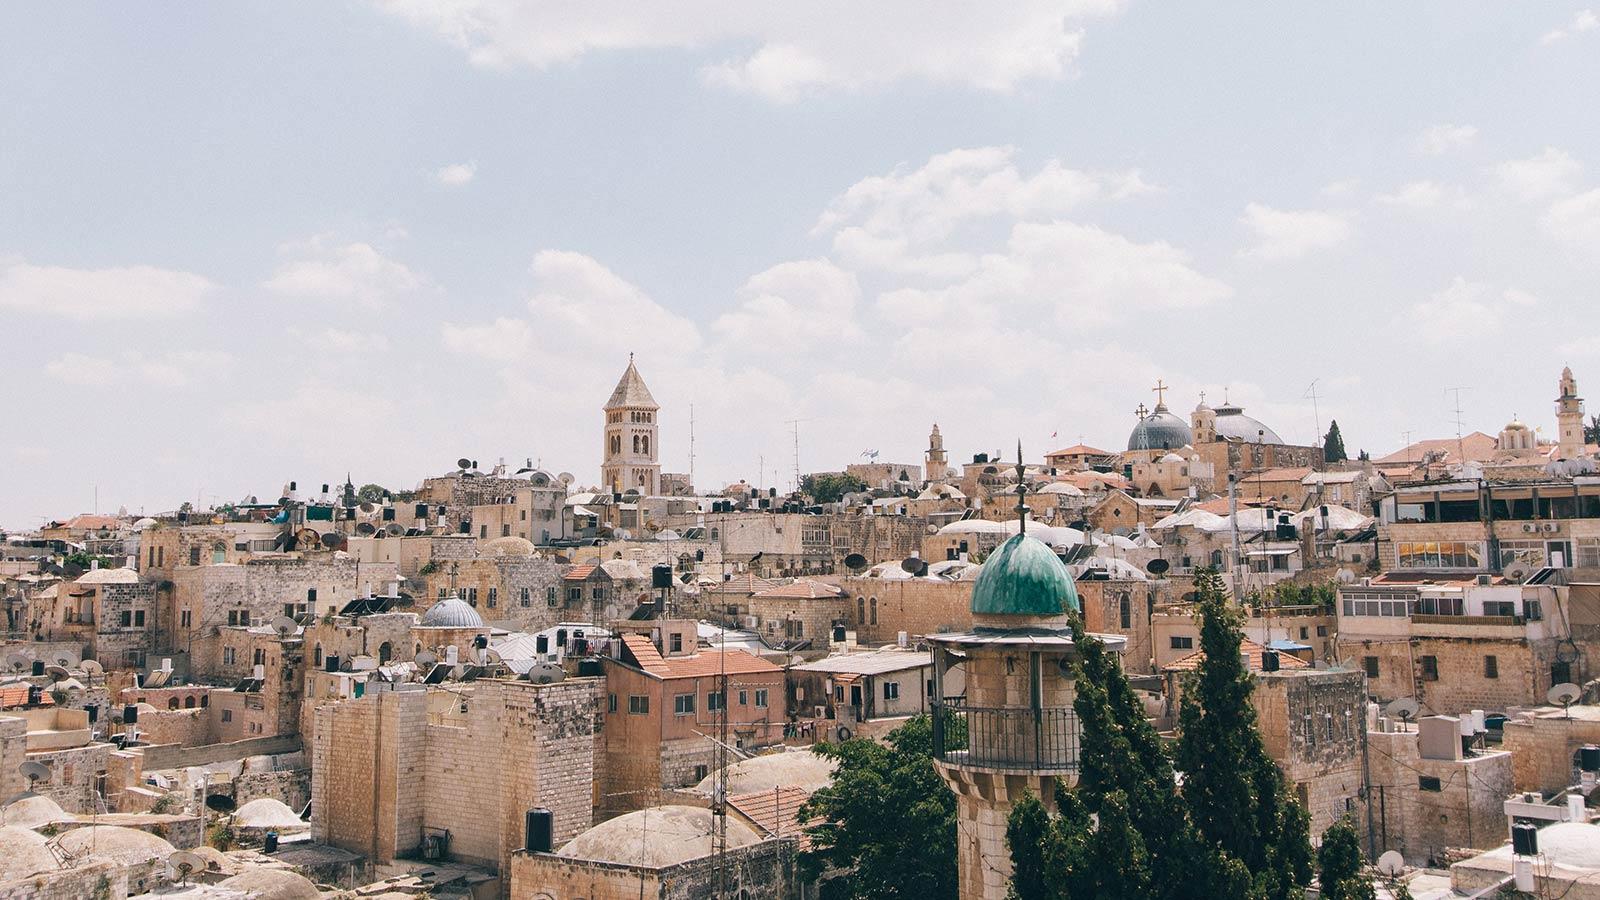 jerusalem israel city view